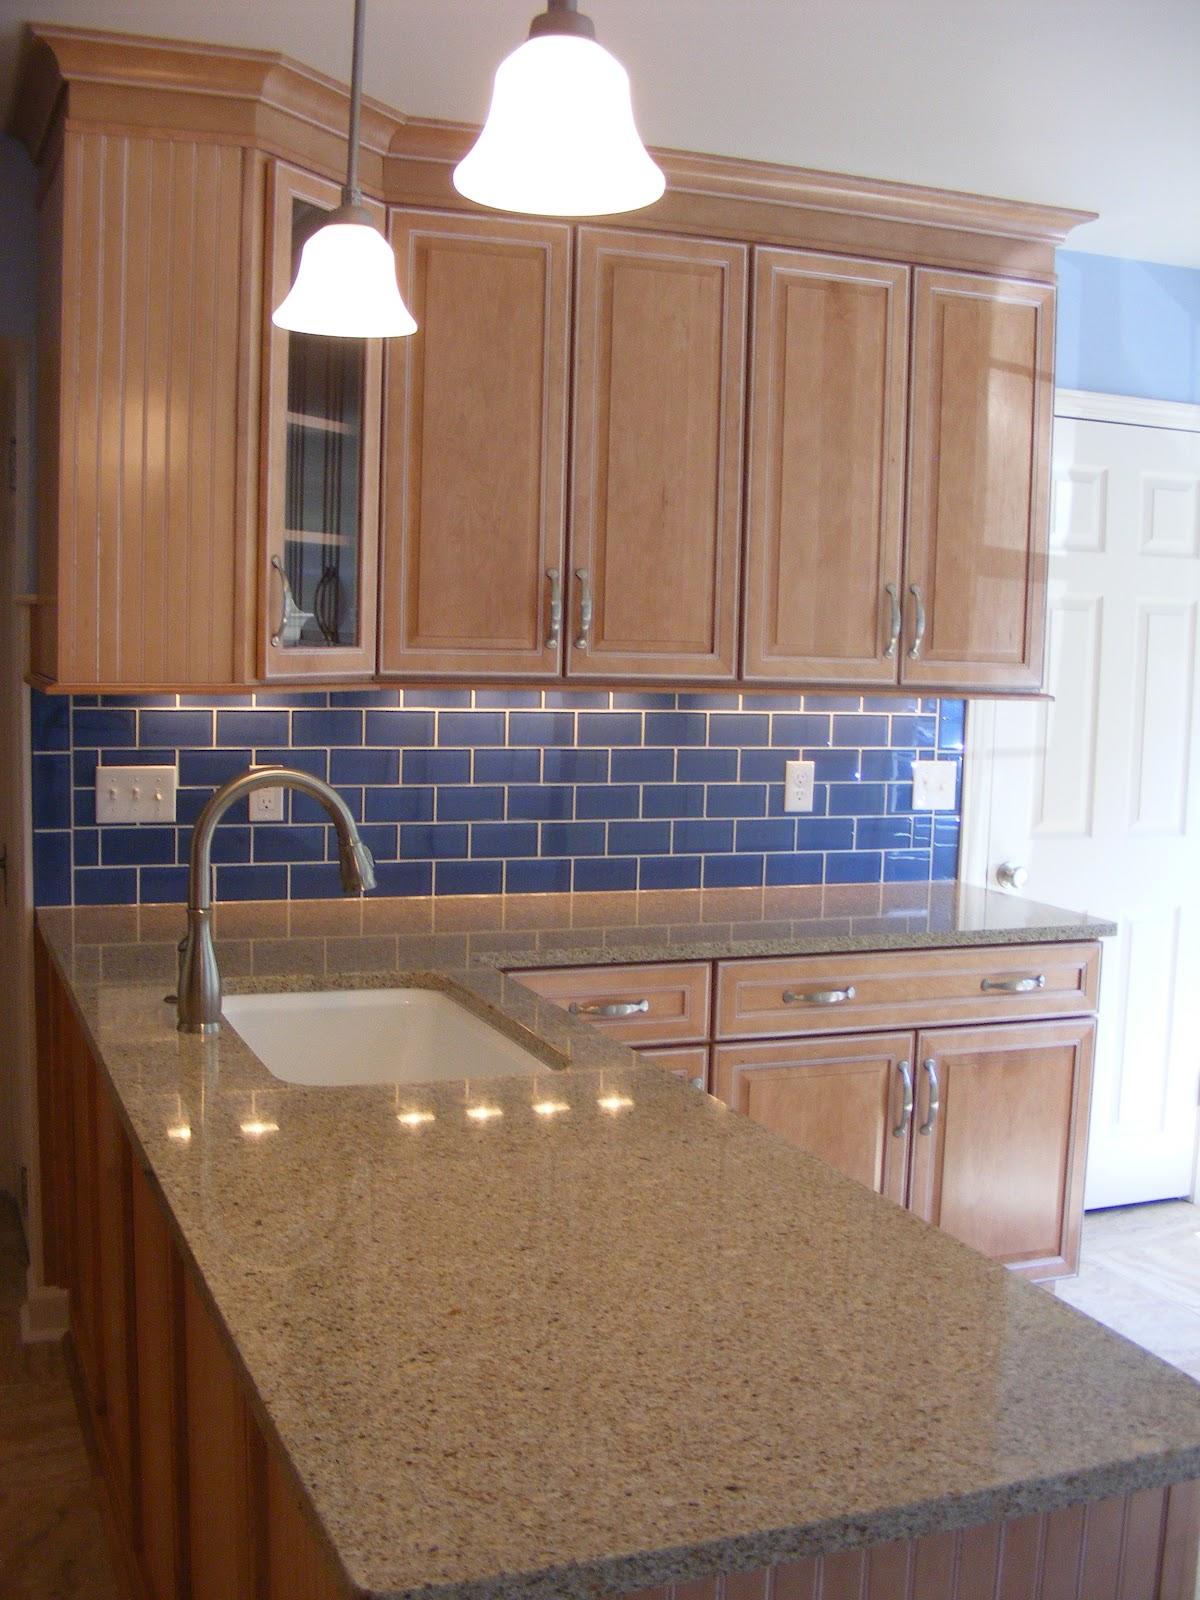 Mhi Interiors Kitchen Remodel